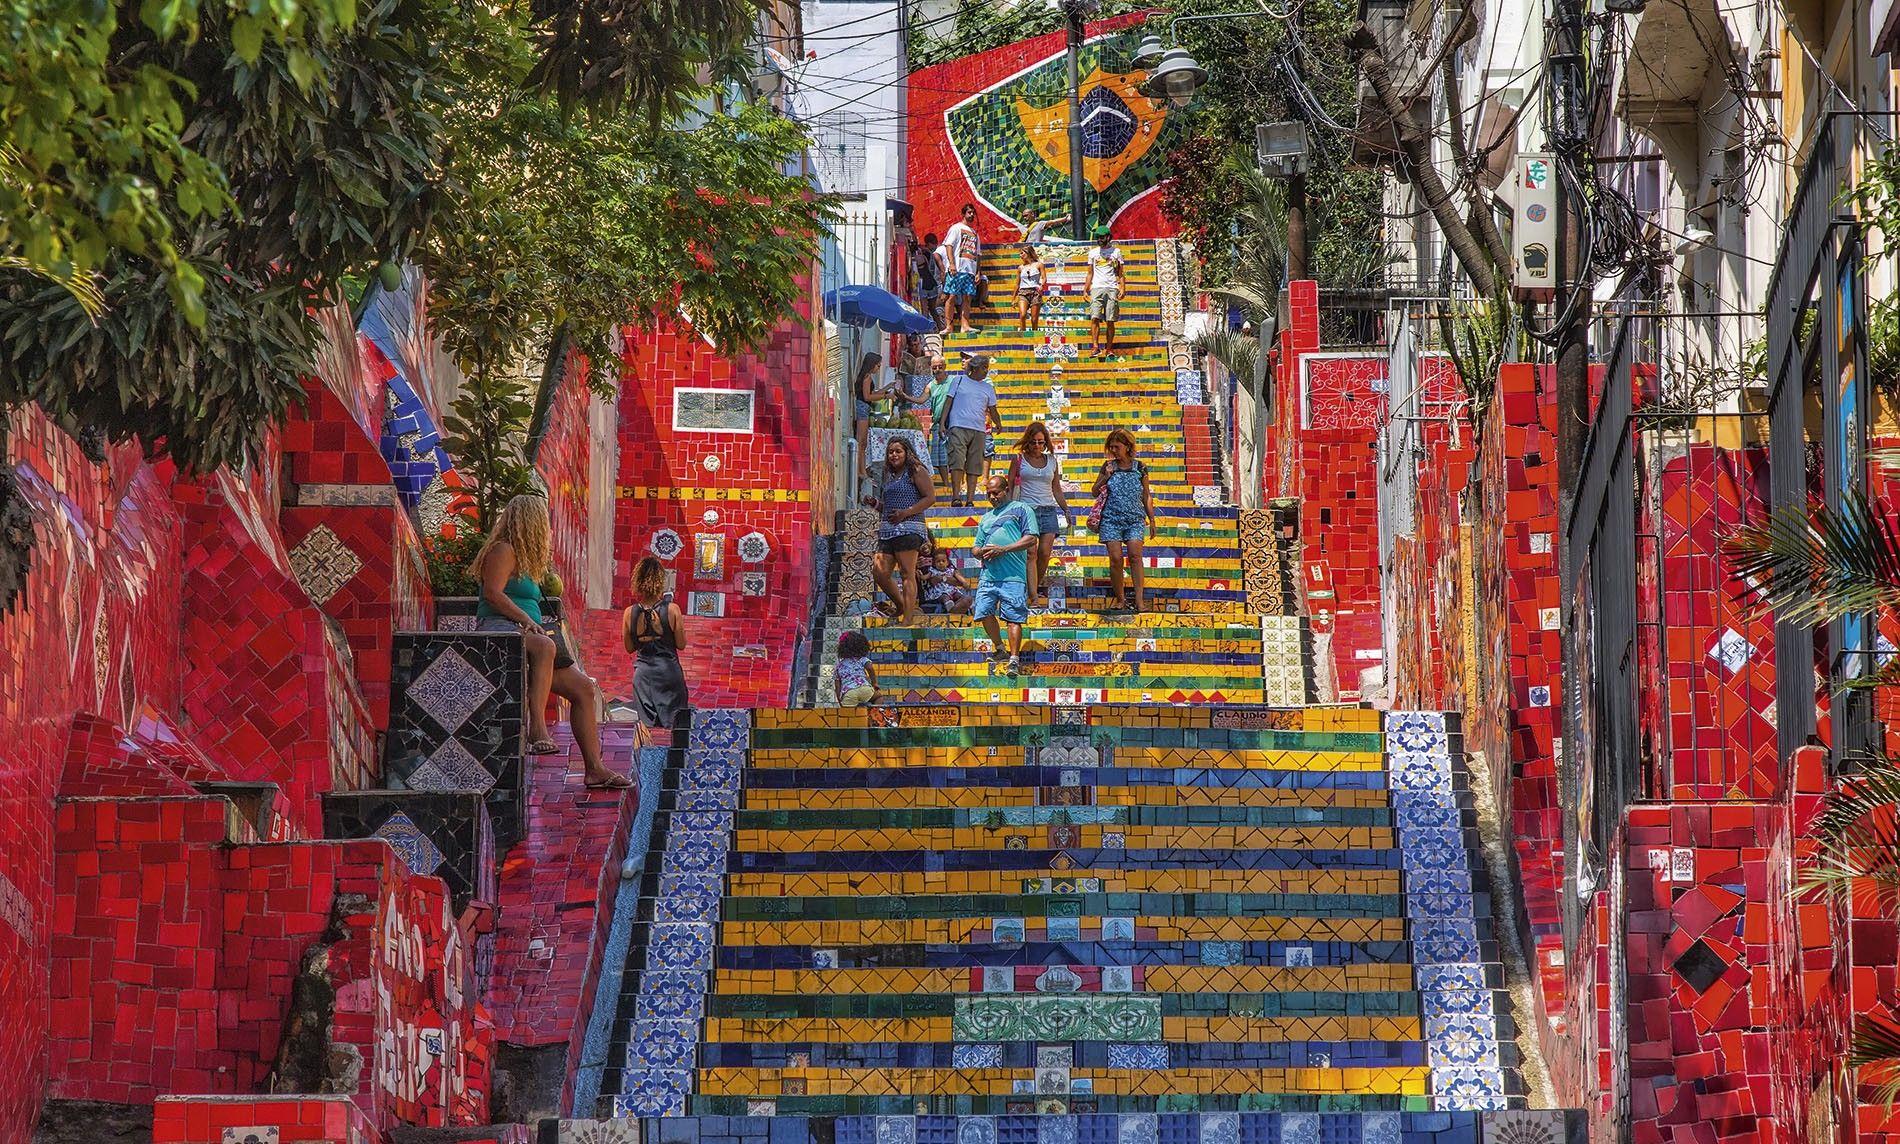 Escadaria Selaron, stairway in Lapa district